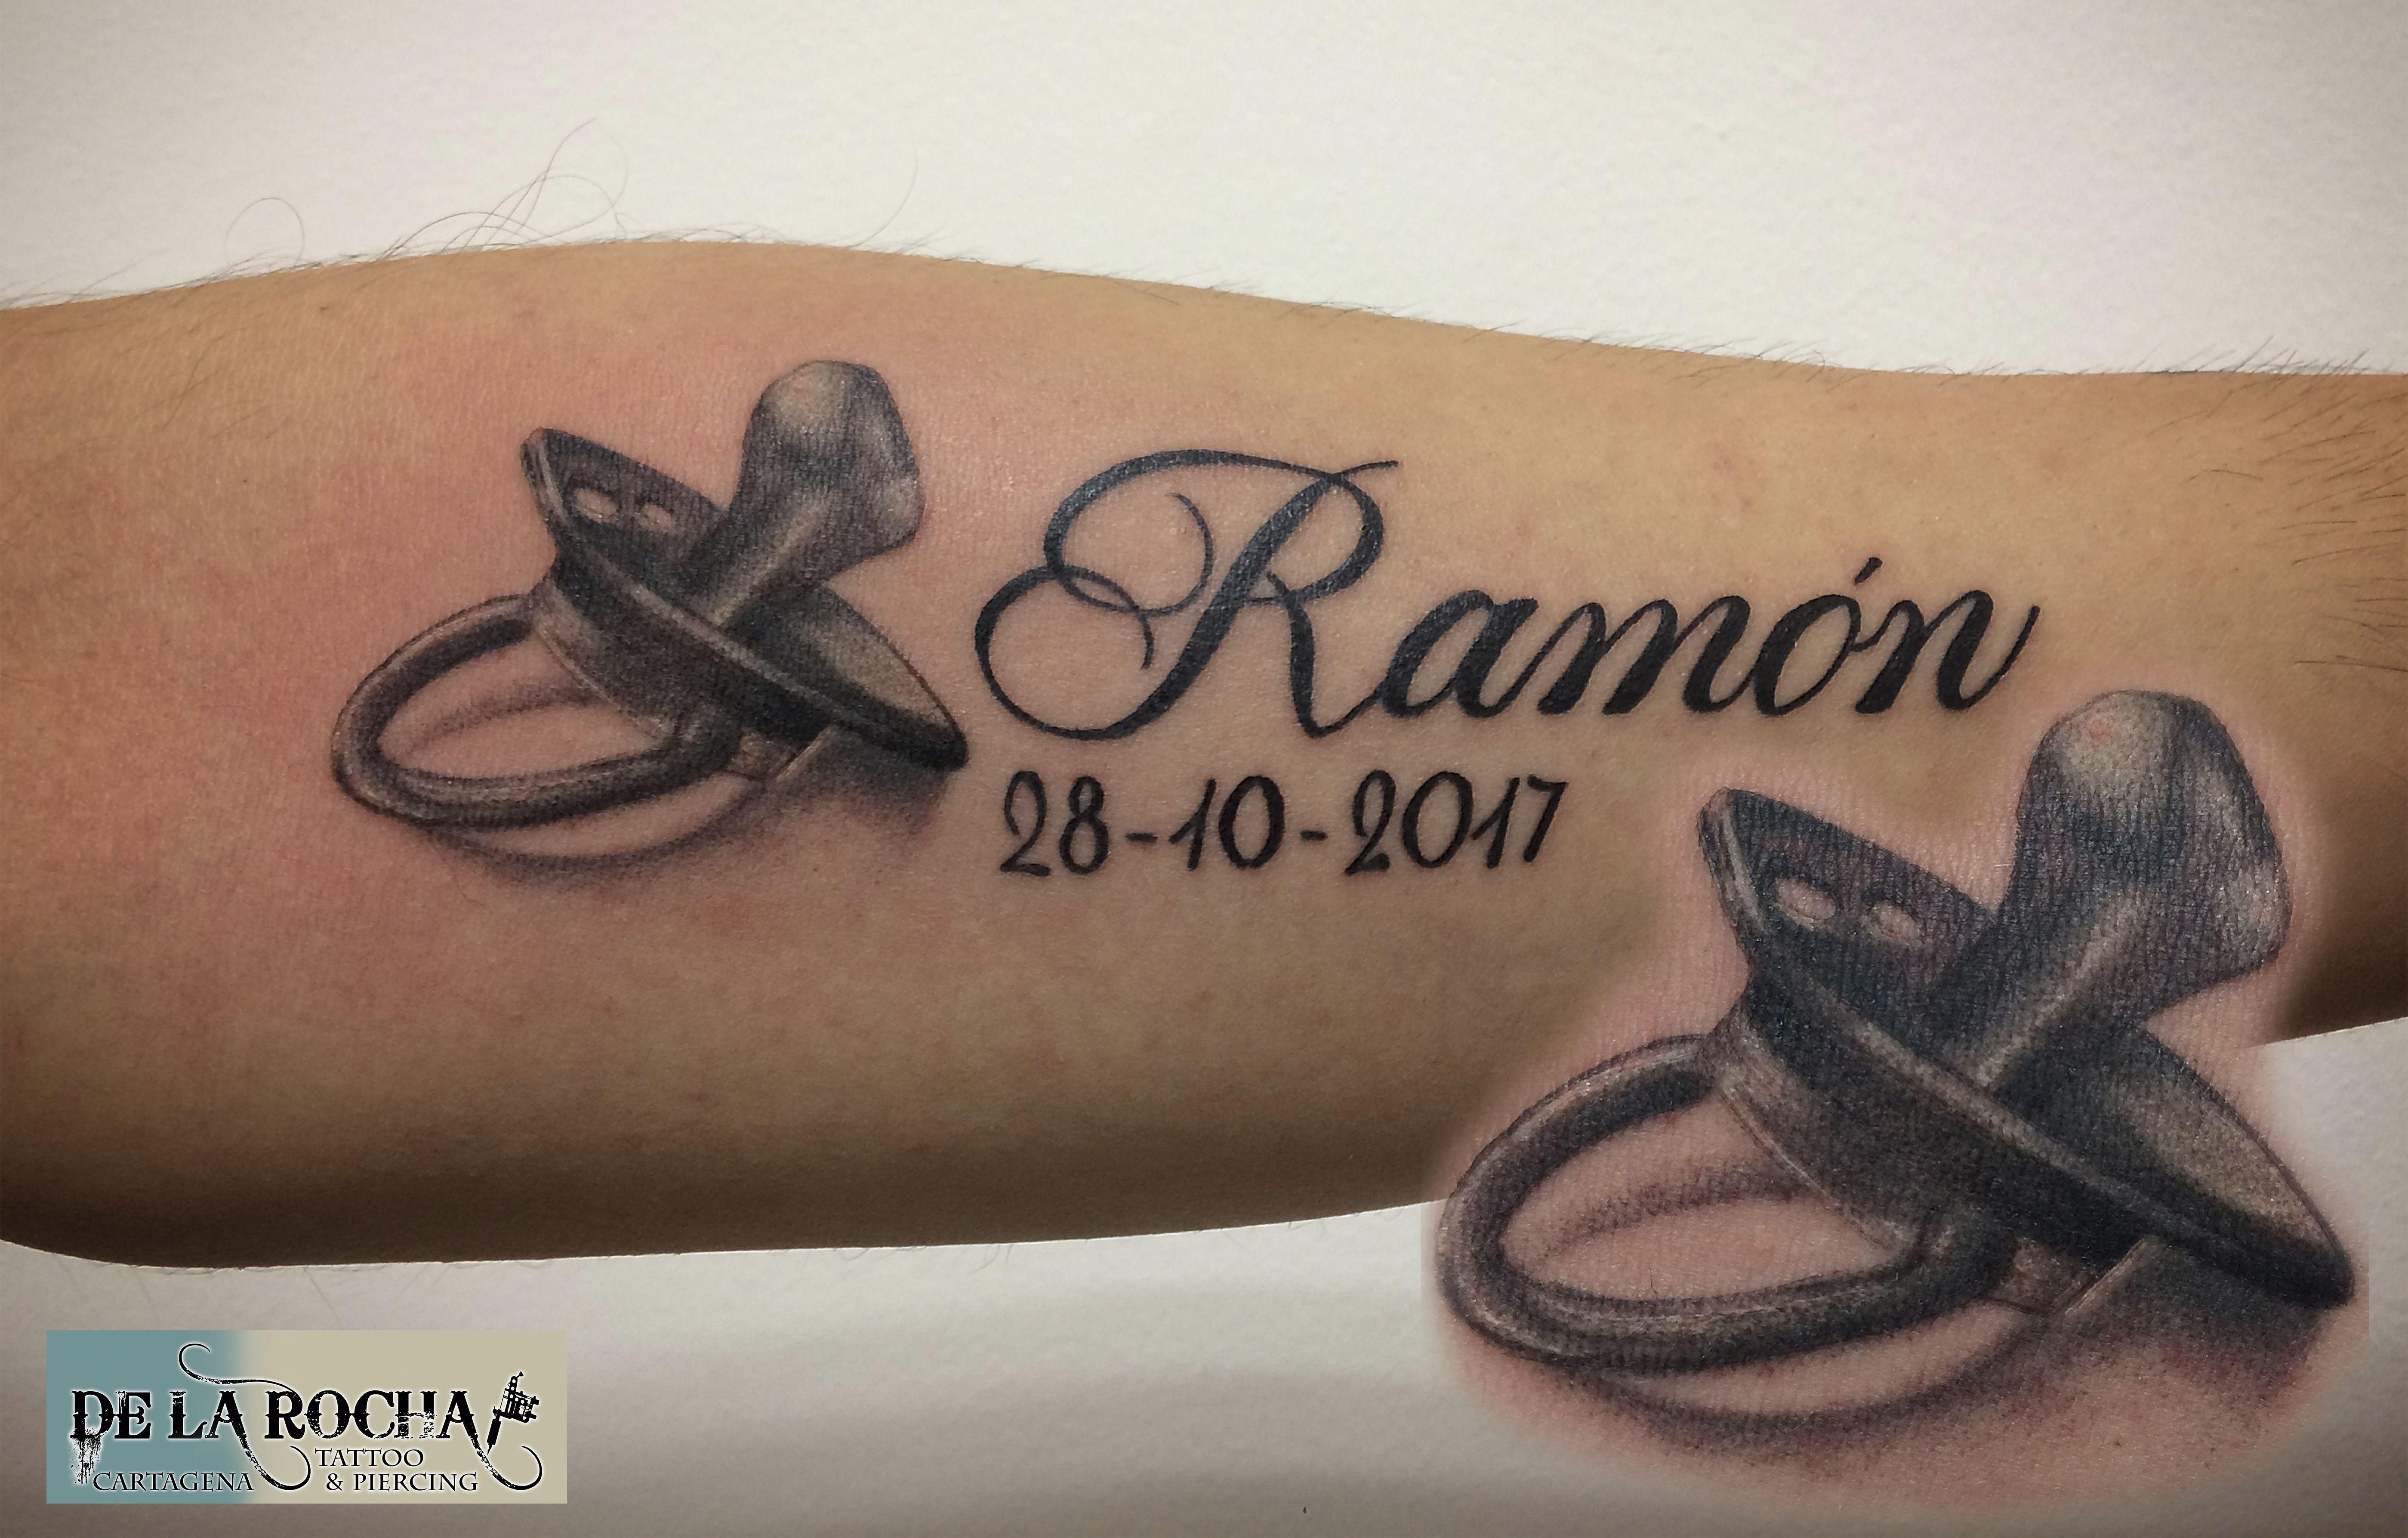 Tatuaje Chupeta Realista Tatuajes De Nombres Tatuajes Tatuajes De Maternidad